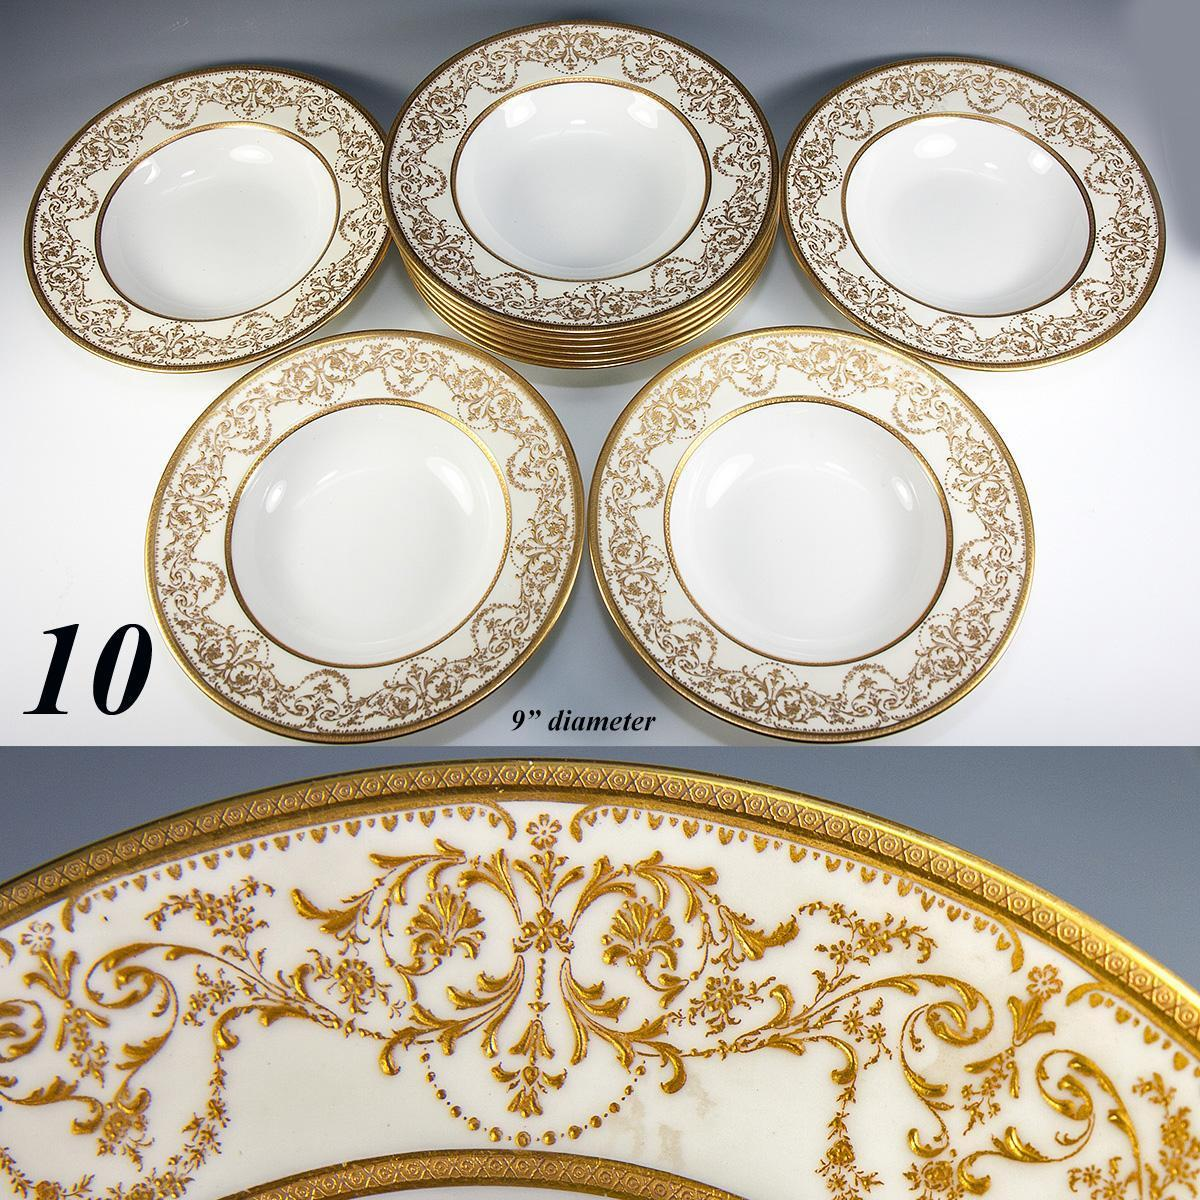 Fine Set of 10 Antique Royal Doulton Soup Plates Raised Gold Enamel Encrusted  sc 1 st  eBay & Fine Conjunto de 10 Antiguo Royal Doulton platos de sopa levantó ...